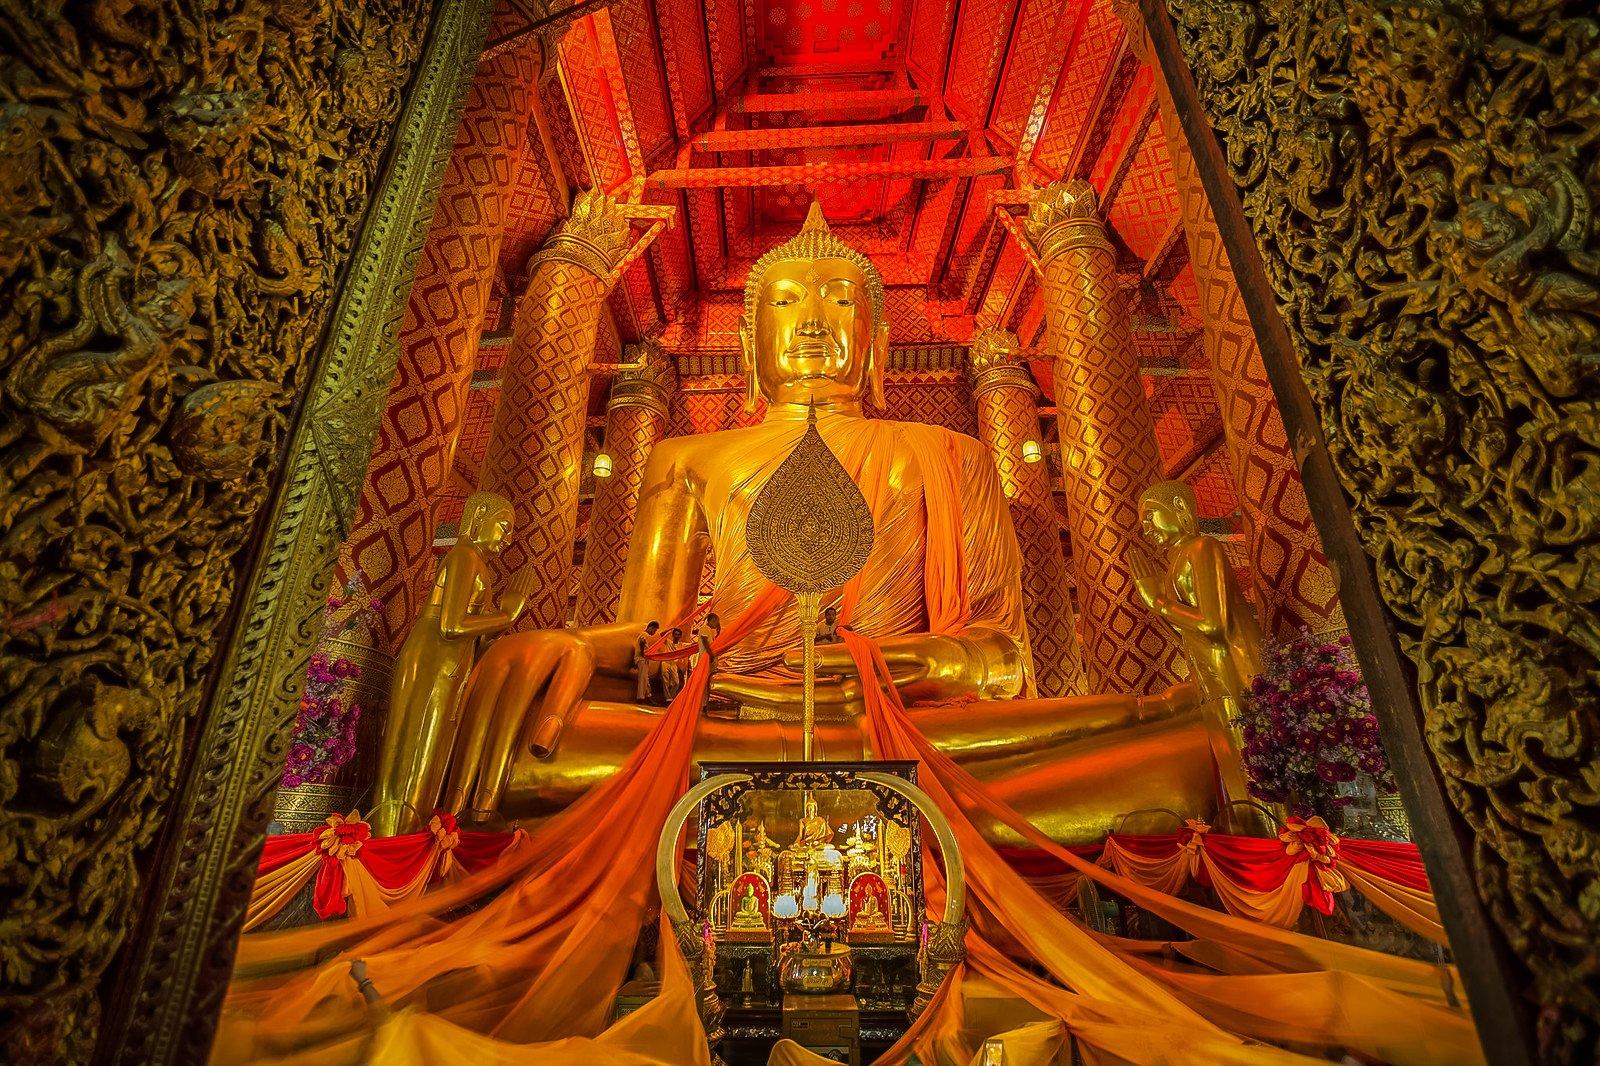 Buddhist temple Wat Phanan Choeng is part of Ayutthaya Historical Park in Ayutthaya City, Thailand.